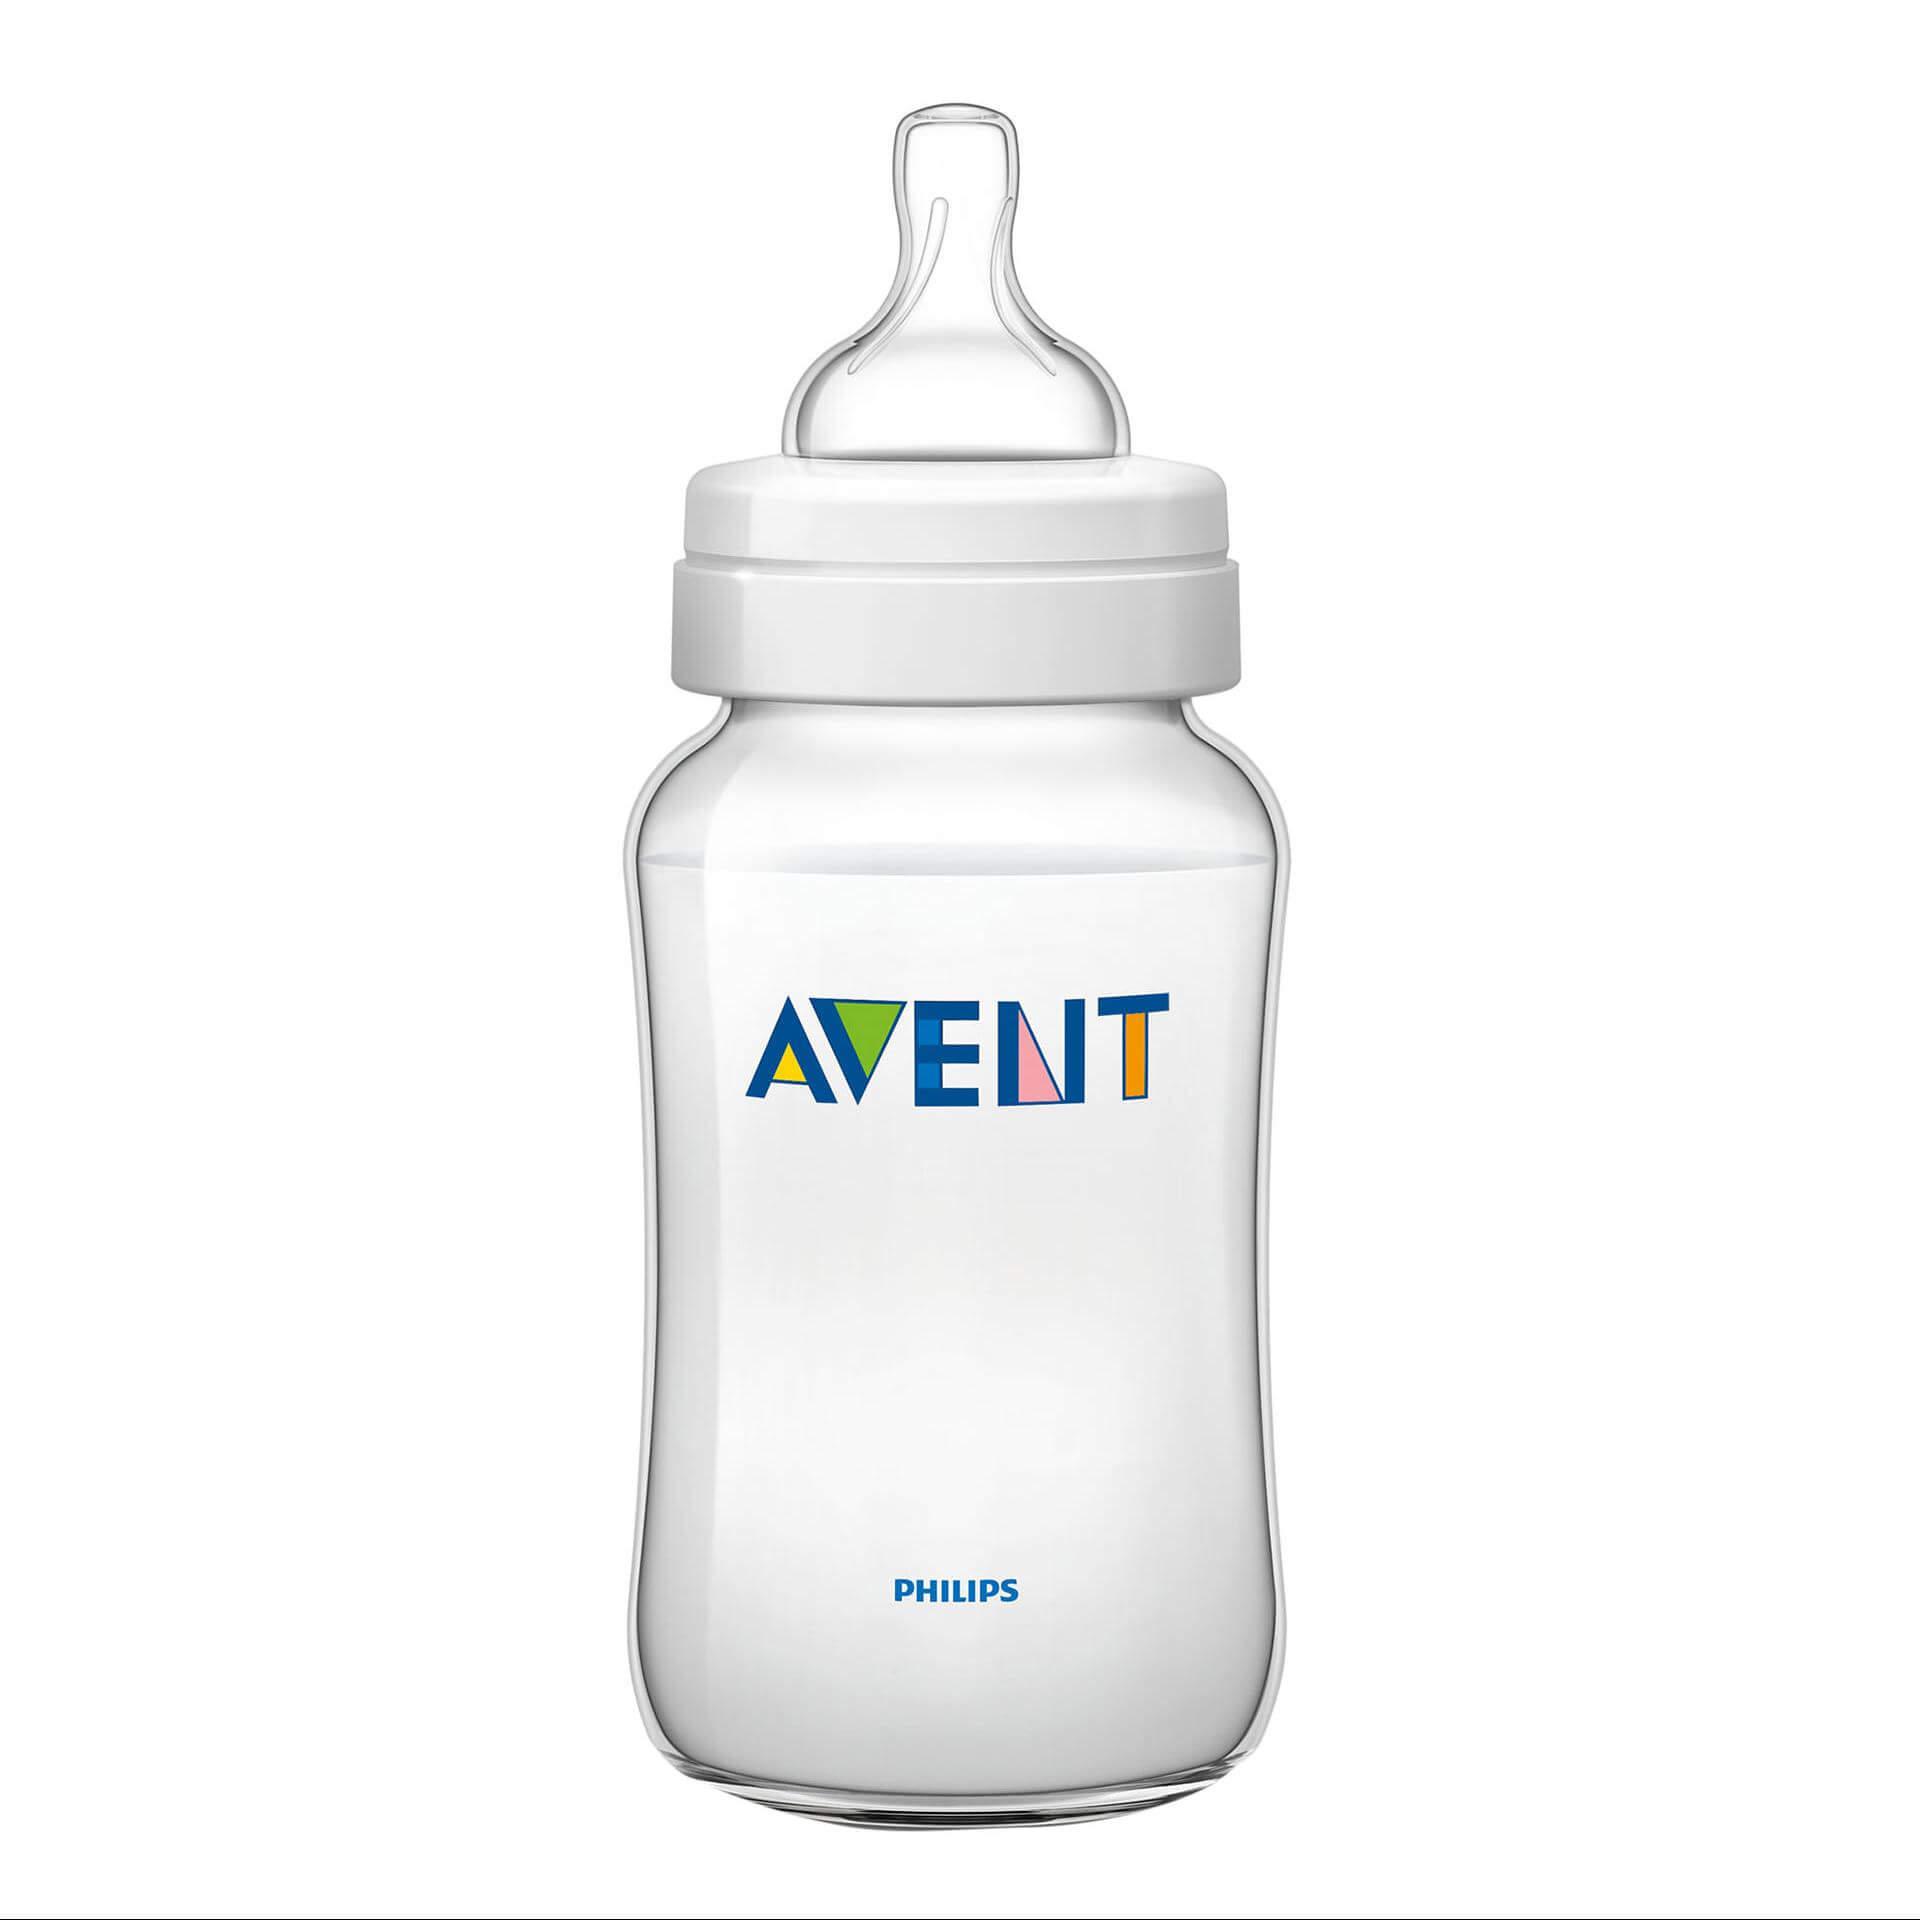 Avent Classic+ Πλαστικό Μπιμπερό 3m+ Μηνών με Πιπίλα Σιλικόνης330ml Χωρίς BPA SCF566/17